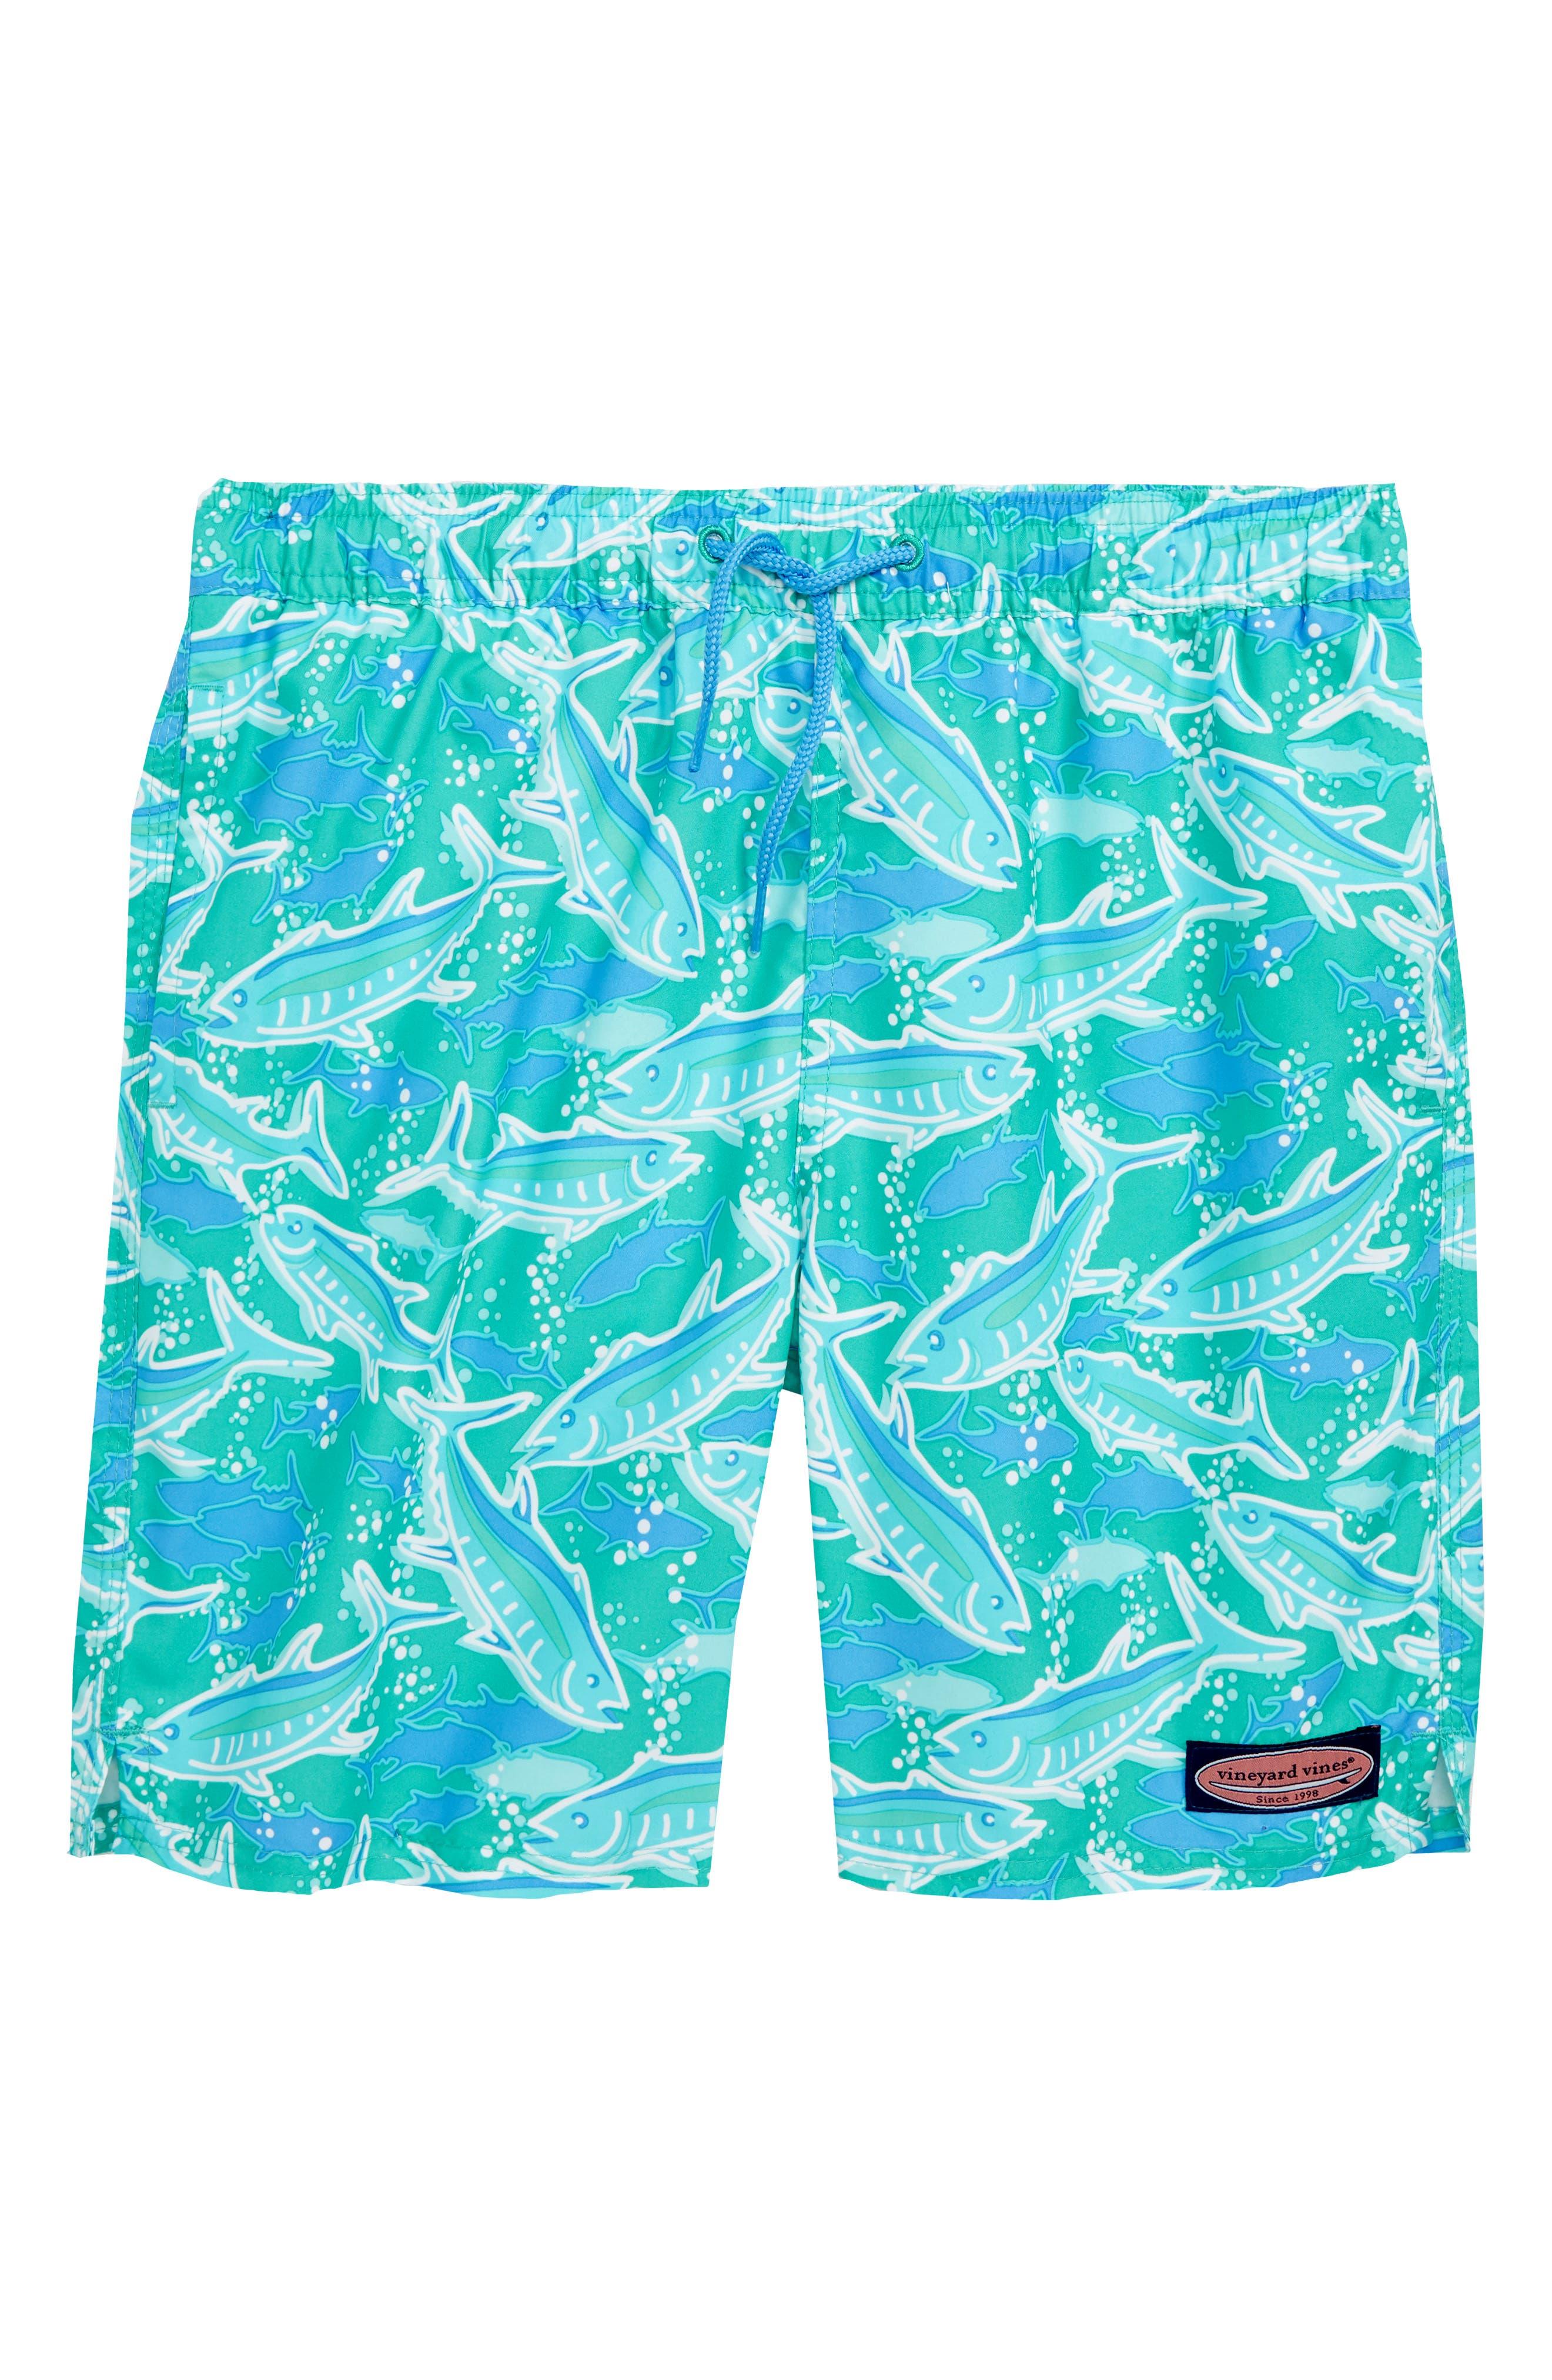 Chappy School of Tuna Swim Trunks,                             Main thumbnail 1, color,                             Aquinnah Aqua